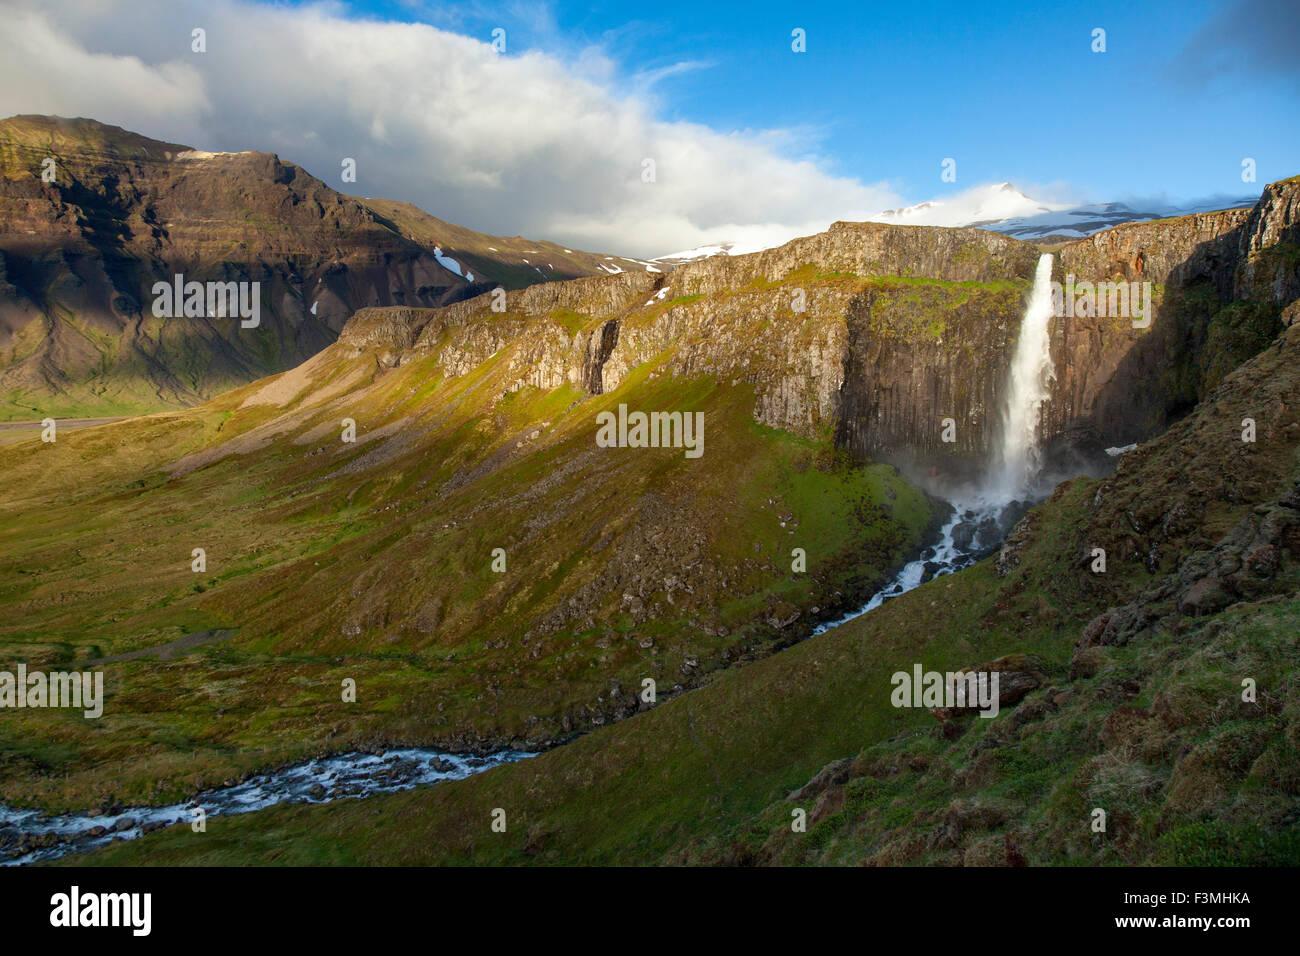 Mountain waterfall near Grundarfjordur, Snaefellsnes Peninsula, Vesturland, Iceland. - Stock Image